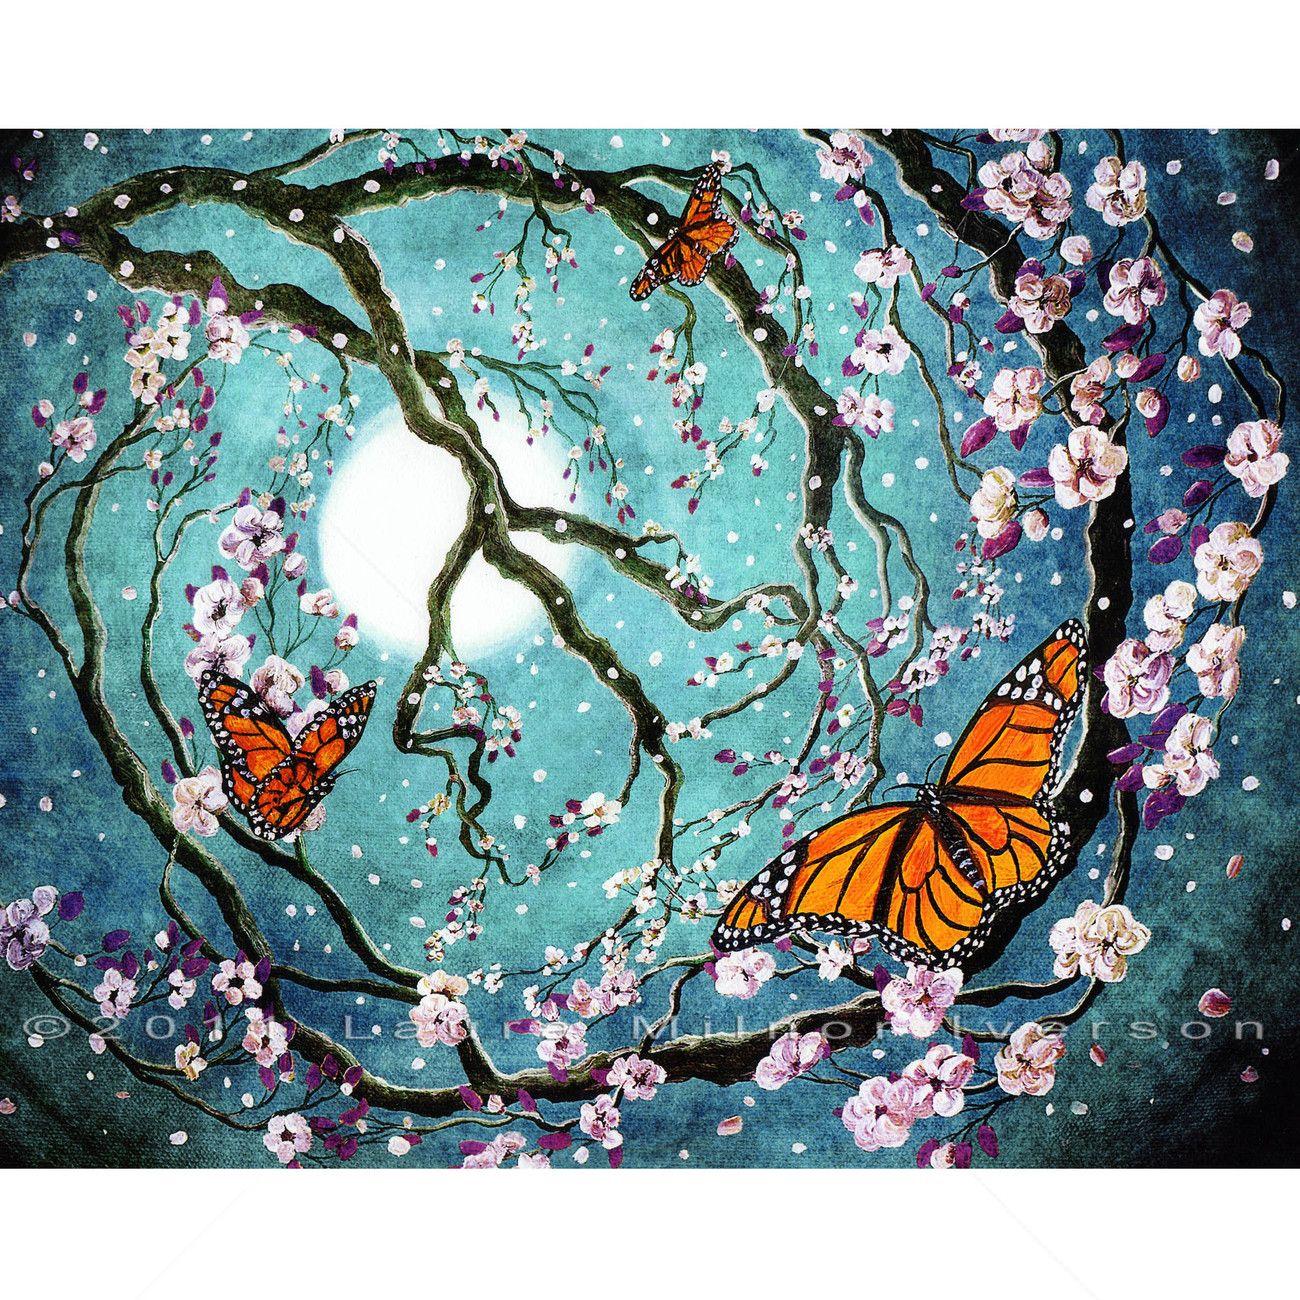 Monarch Butterflies Peace Sign Tree Sakura Cherry Blossoms ...